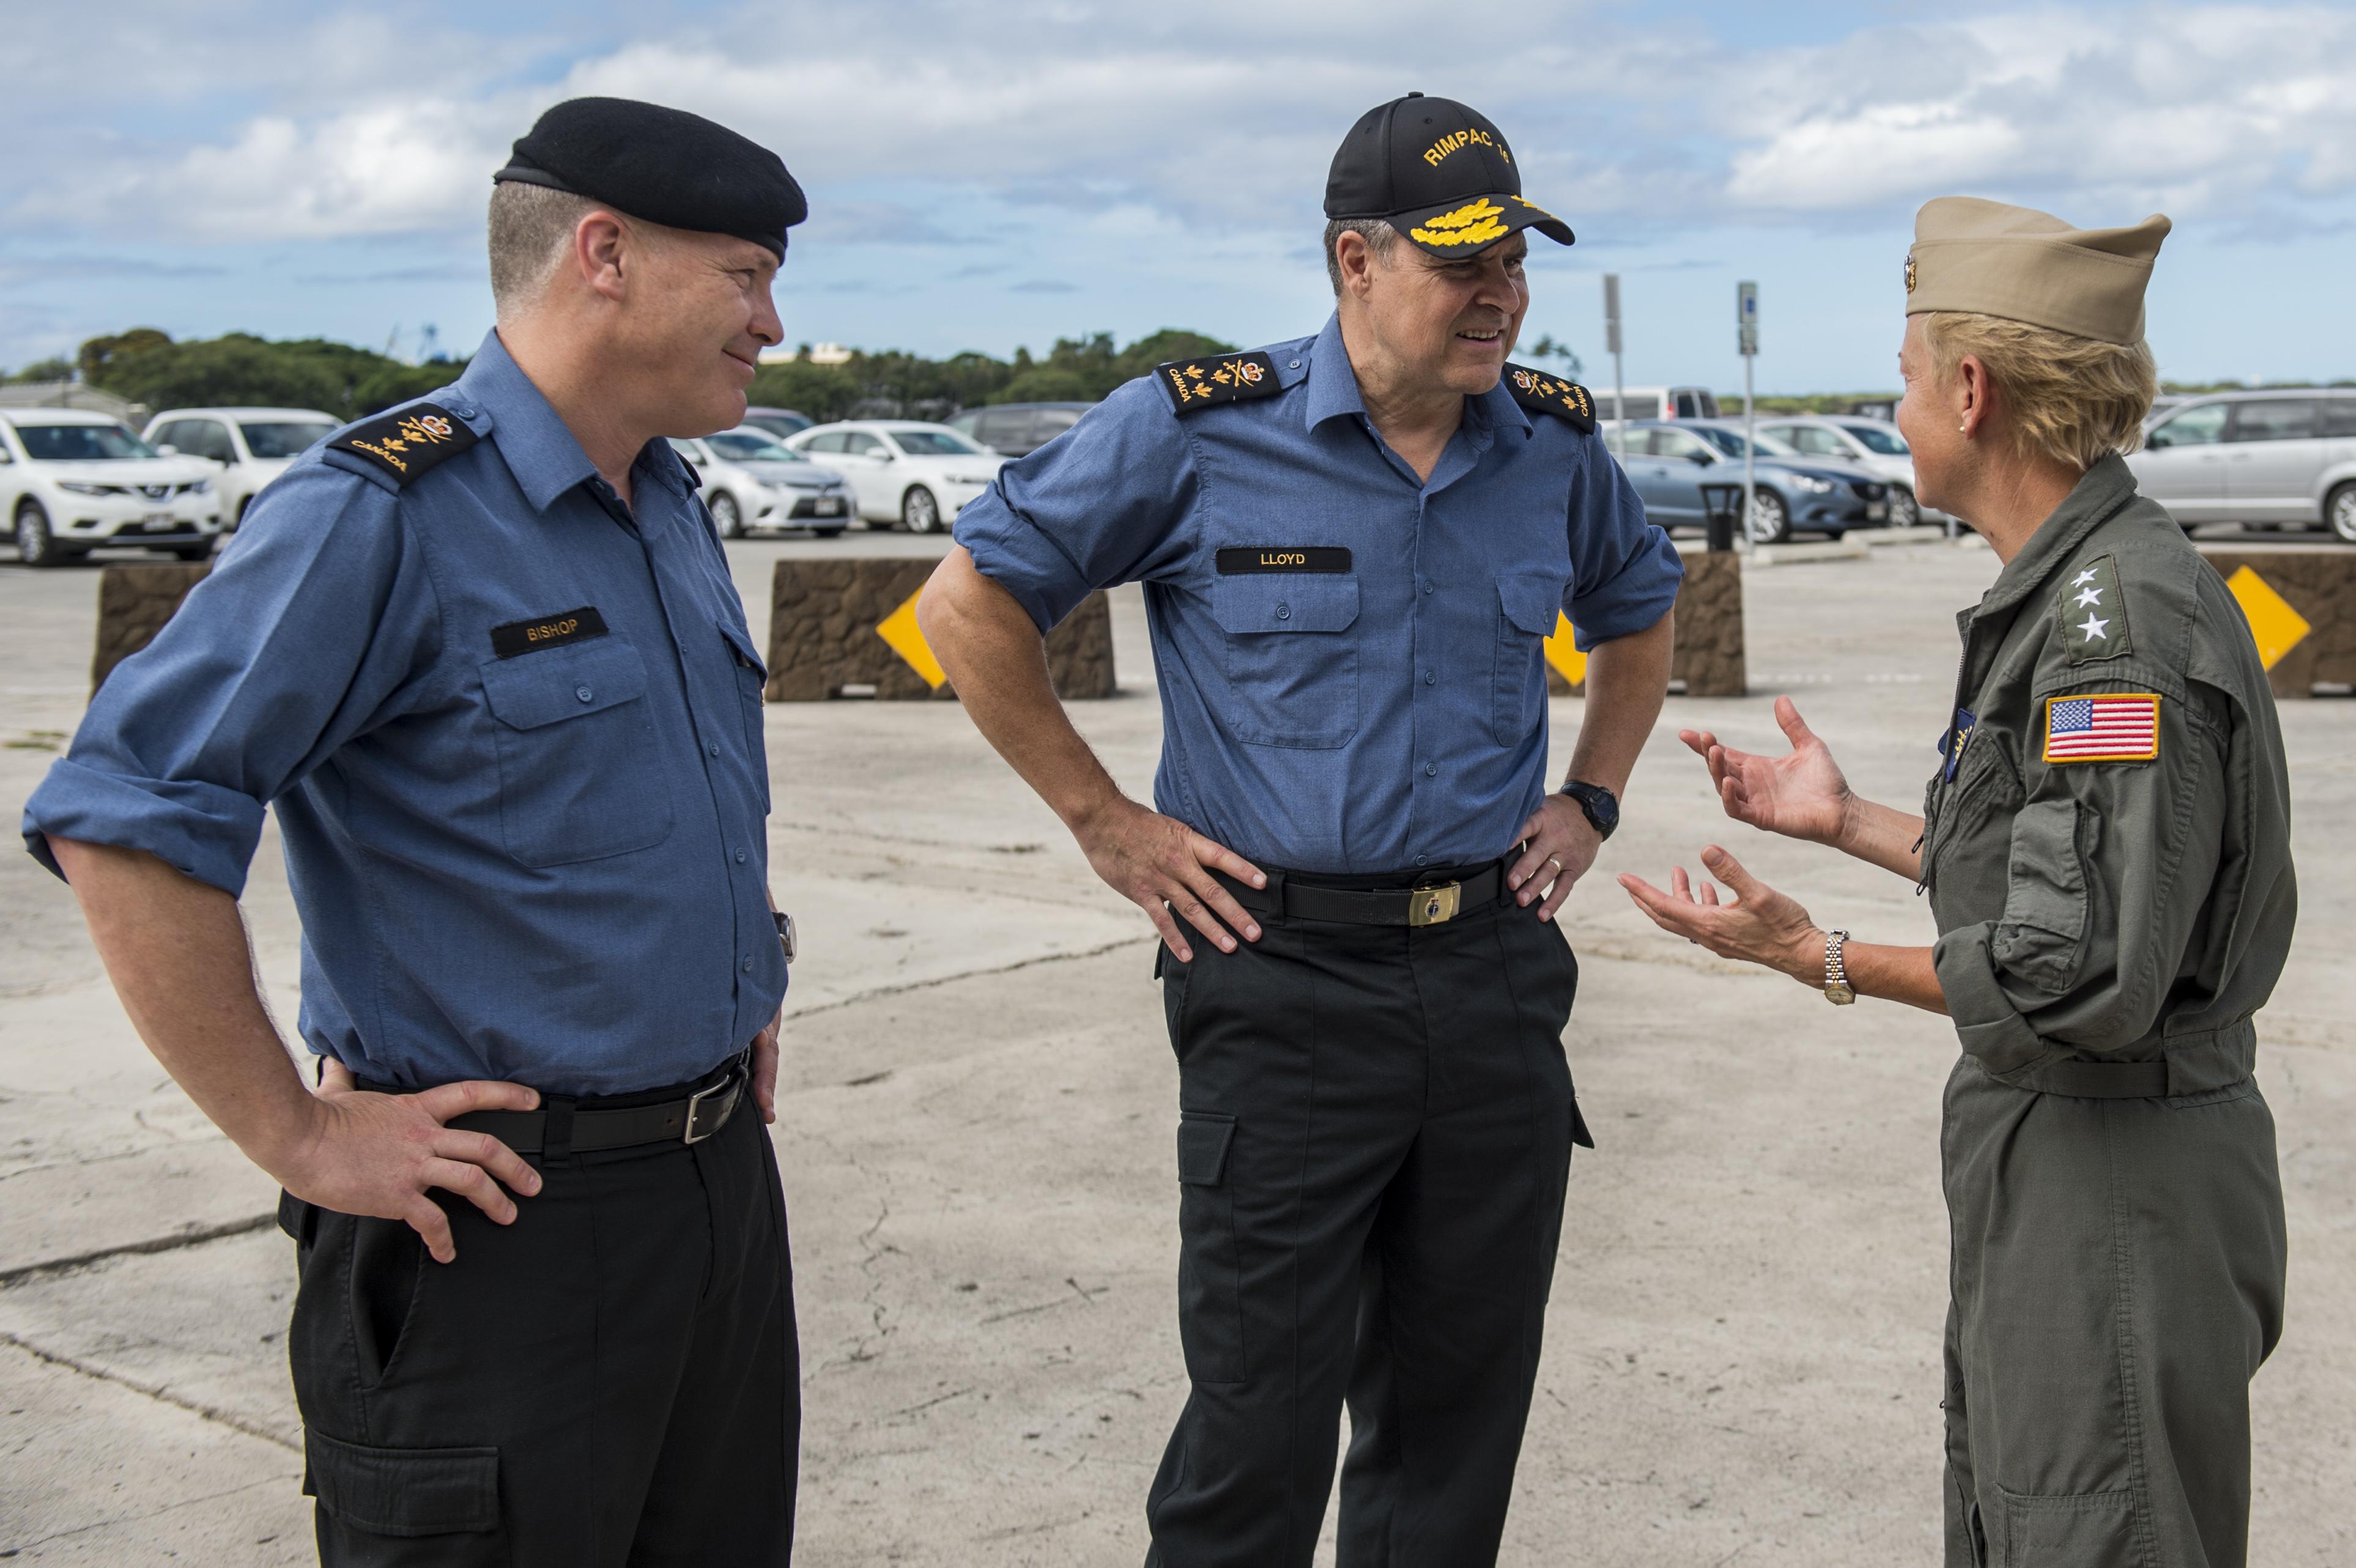 File:Commander of the Royal Canadian Navy Visits RIMPAC